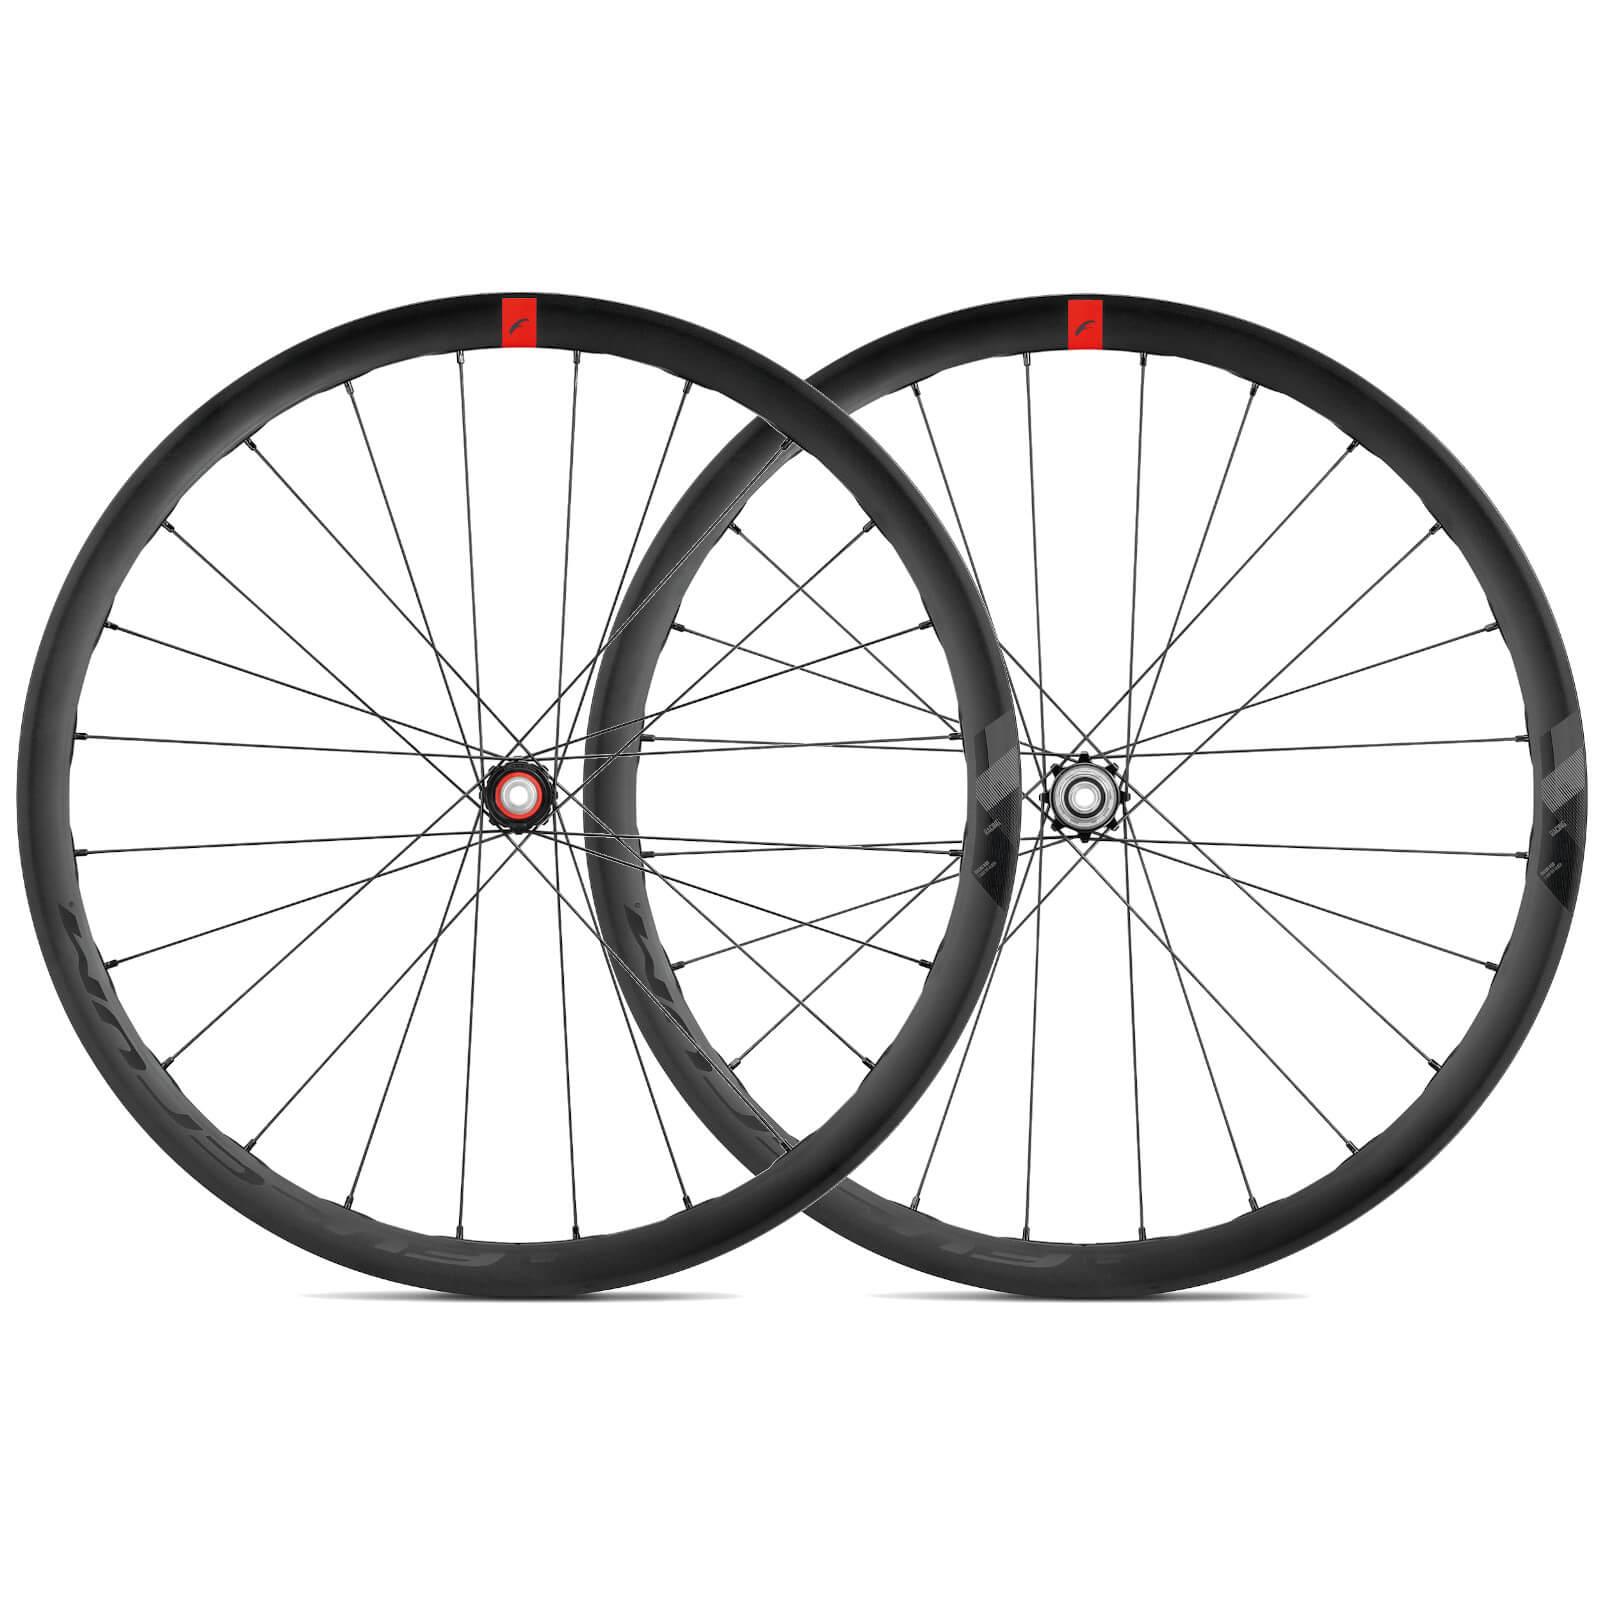 Fulcrum Racing 4 Disc Brake Wheelset - Campagnolo N3W